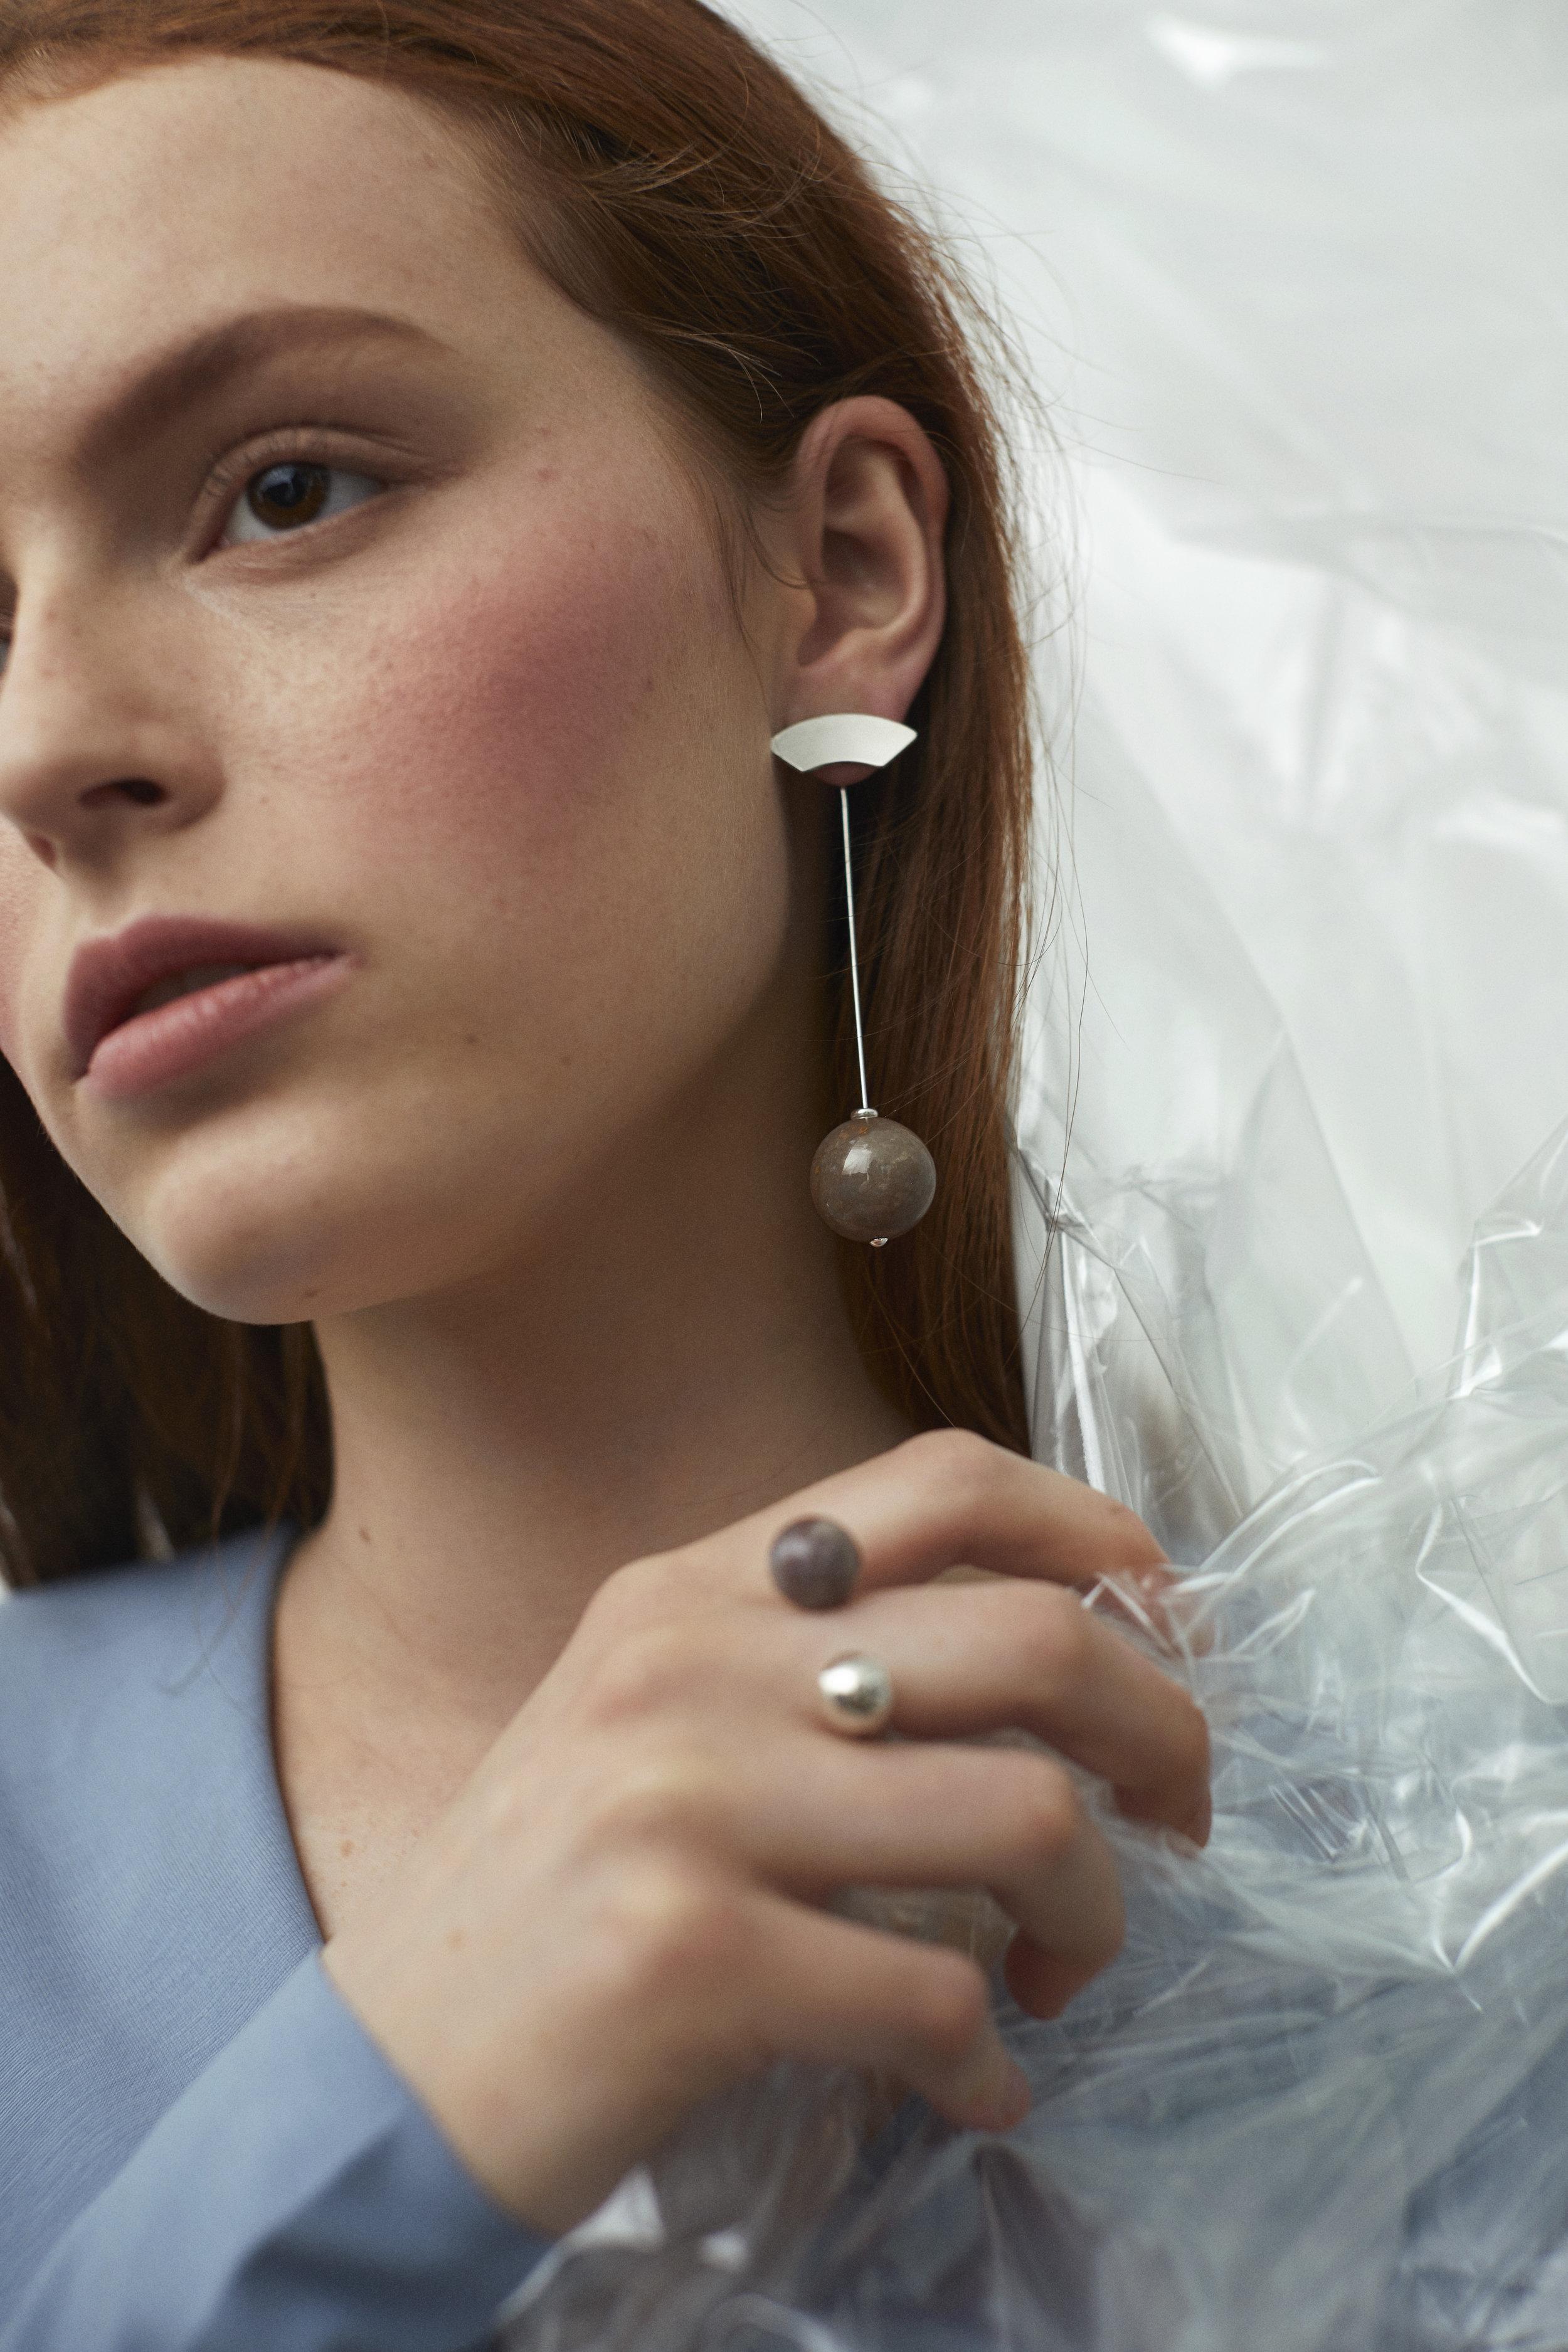 ▲ FERMATA earring set, ARPEGGIO I open ring